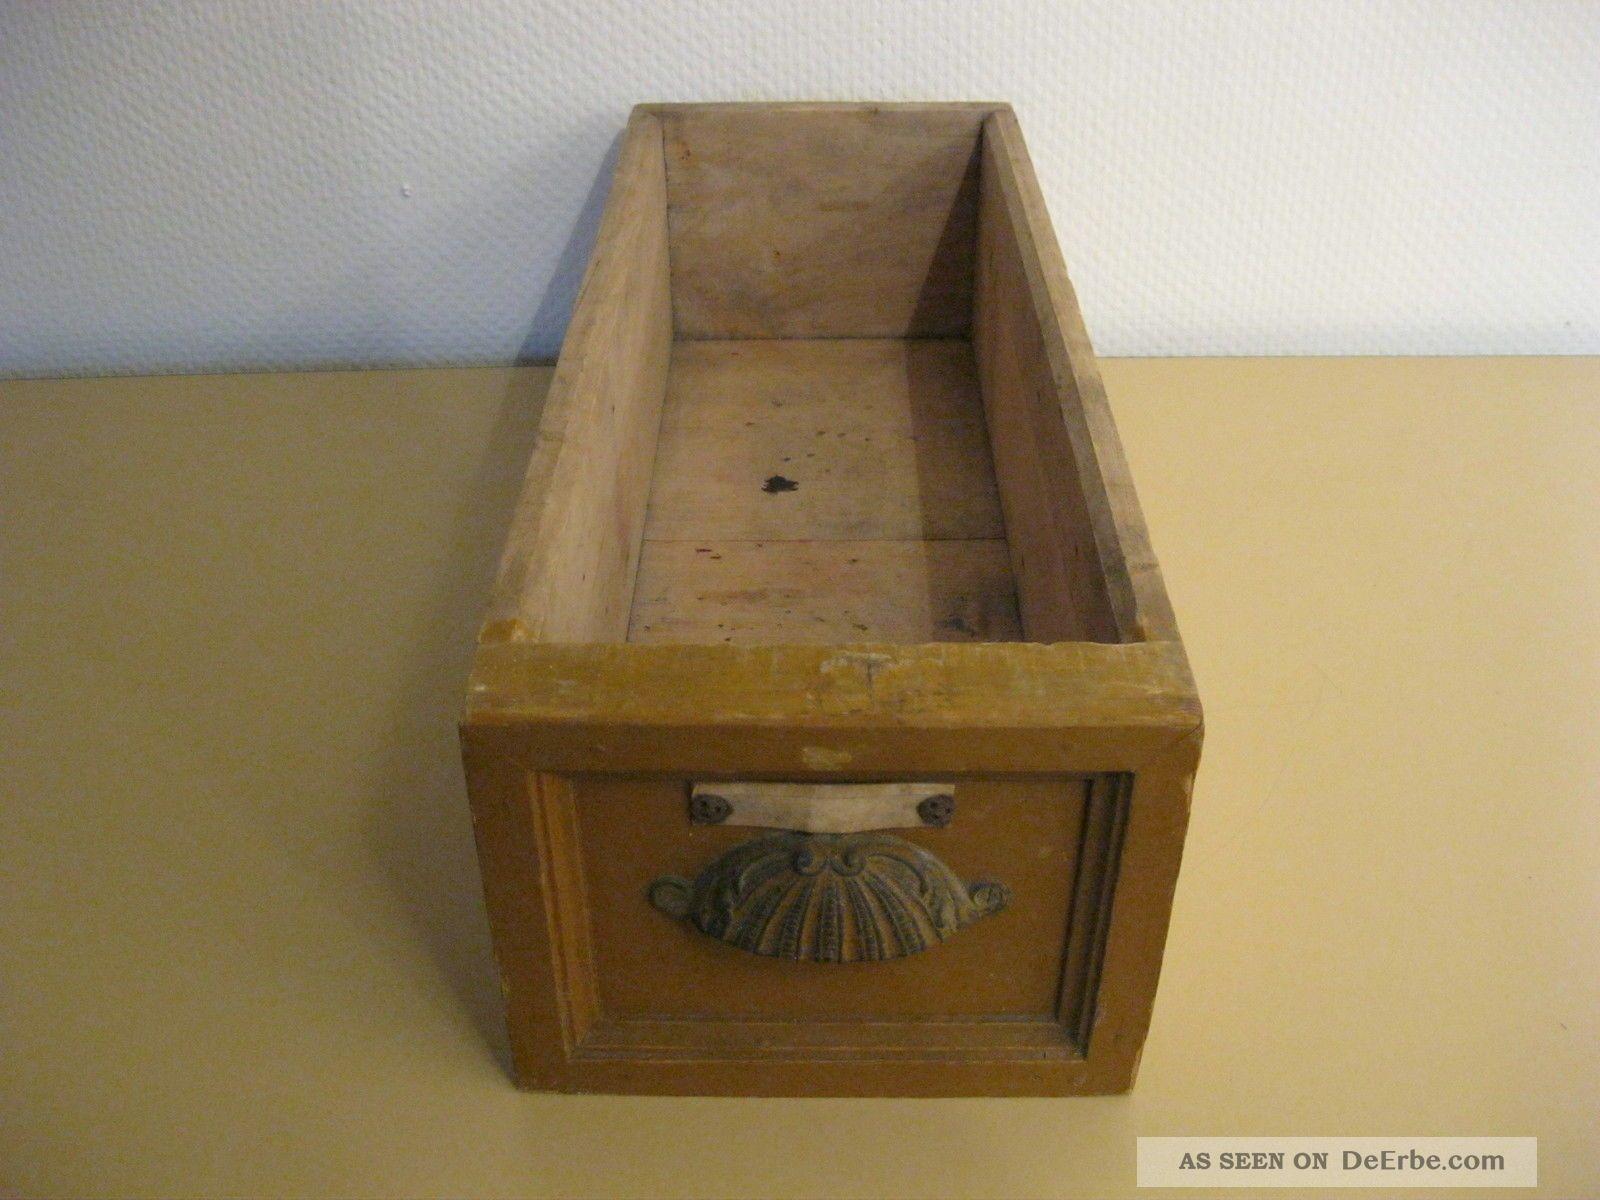 Alte Holzschublade Schublade Holz Tante Emma Laden Apotheke Historismus Ca.  1900 Kaufleute & Krämer Bild